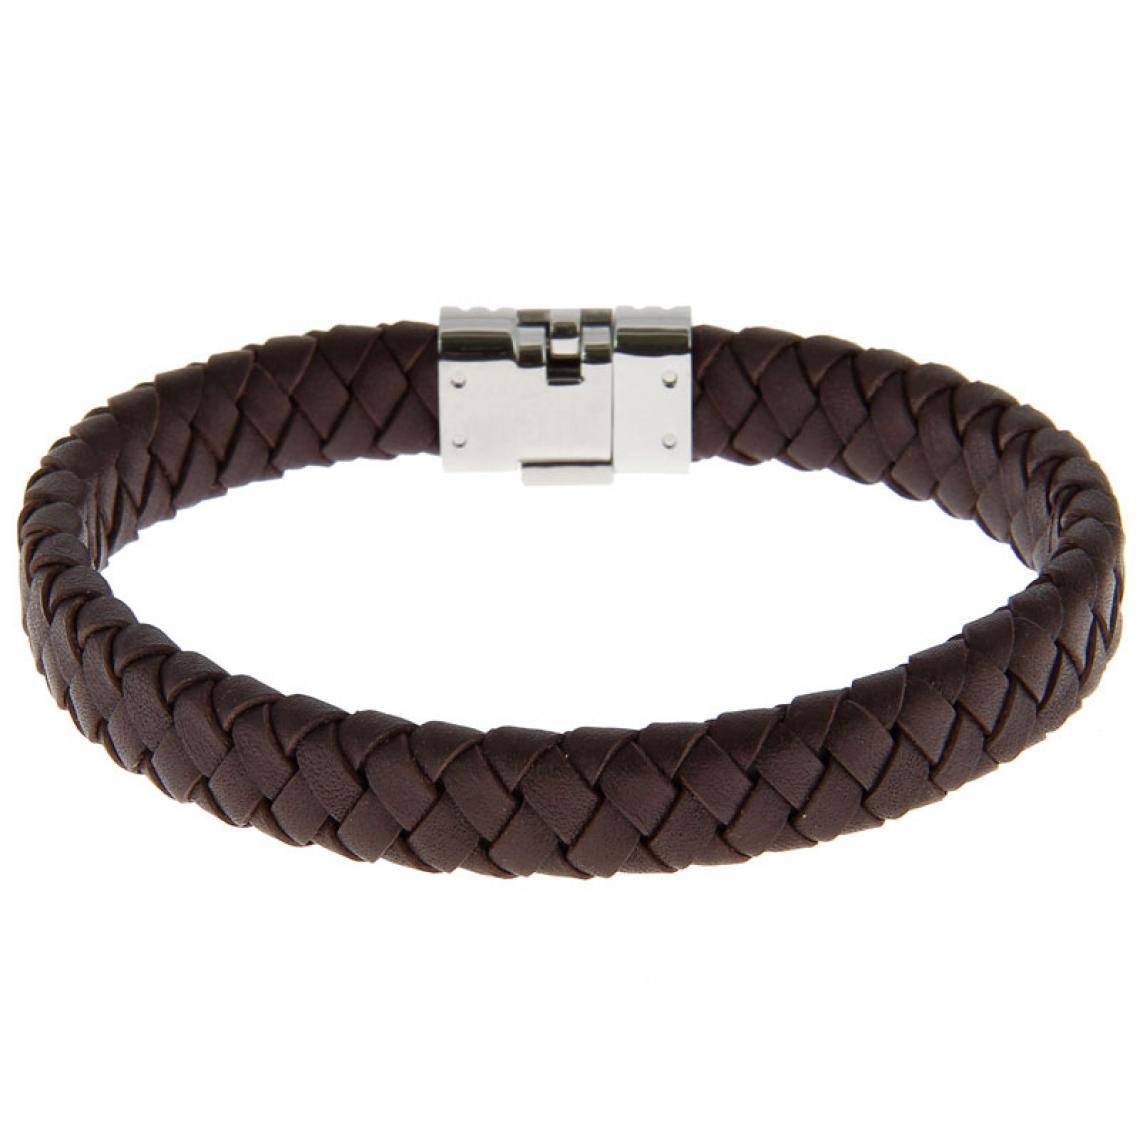 Bracelet Lotus LS1518-2-1 - LS1518-2-1 - Modalova